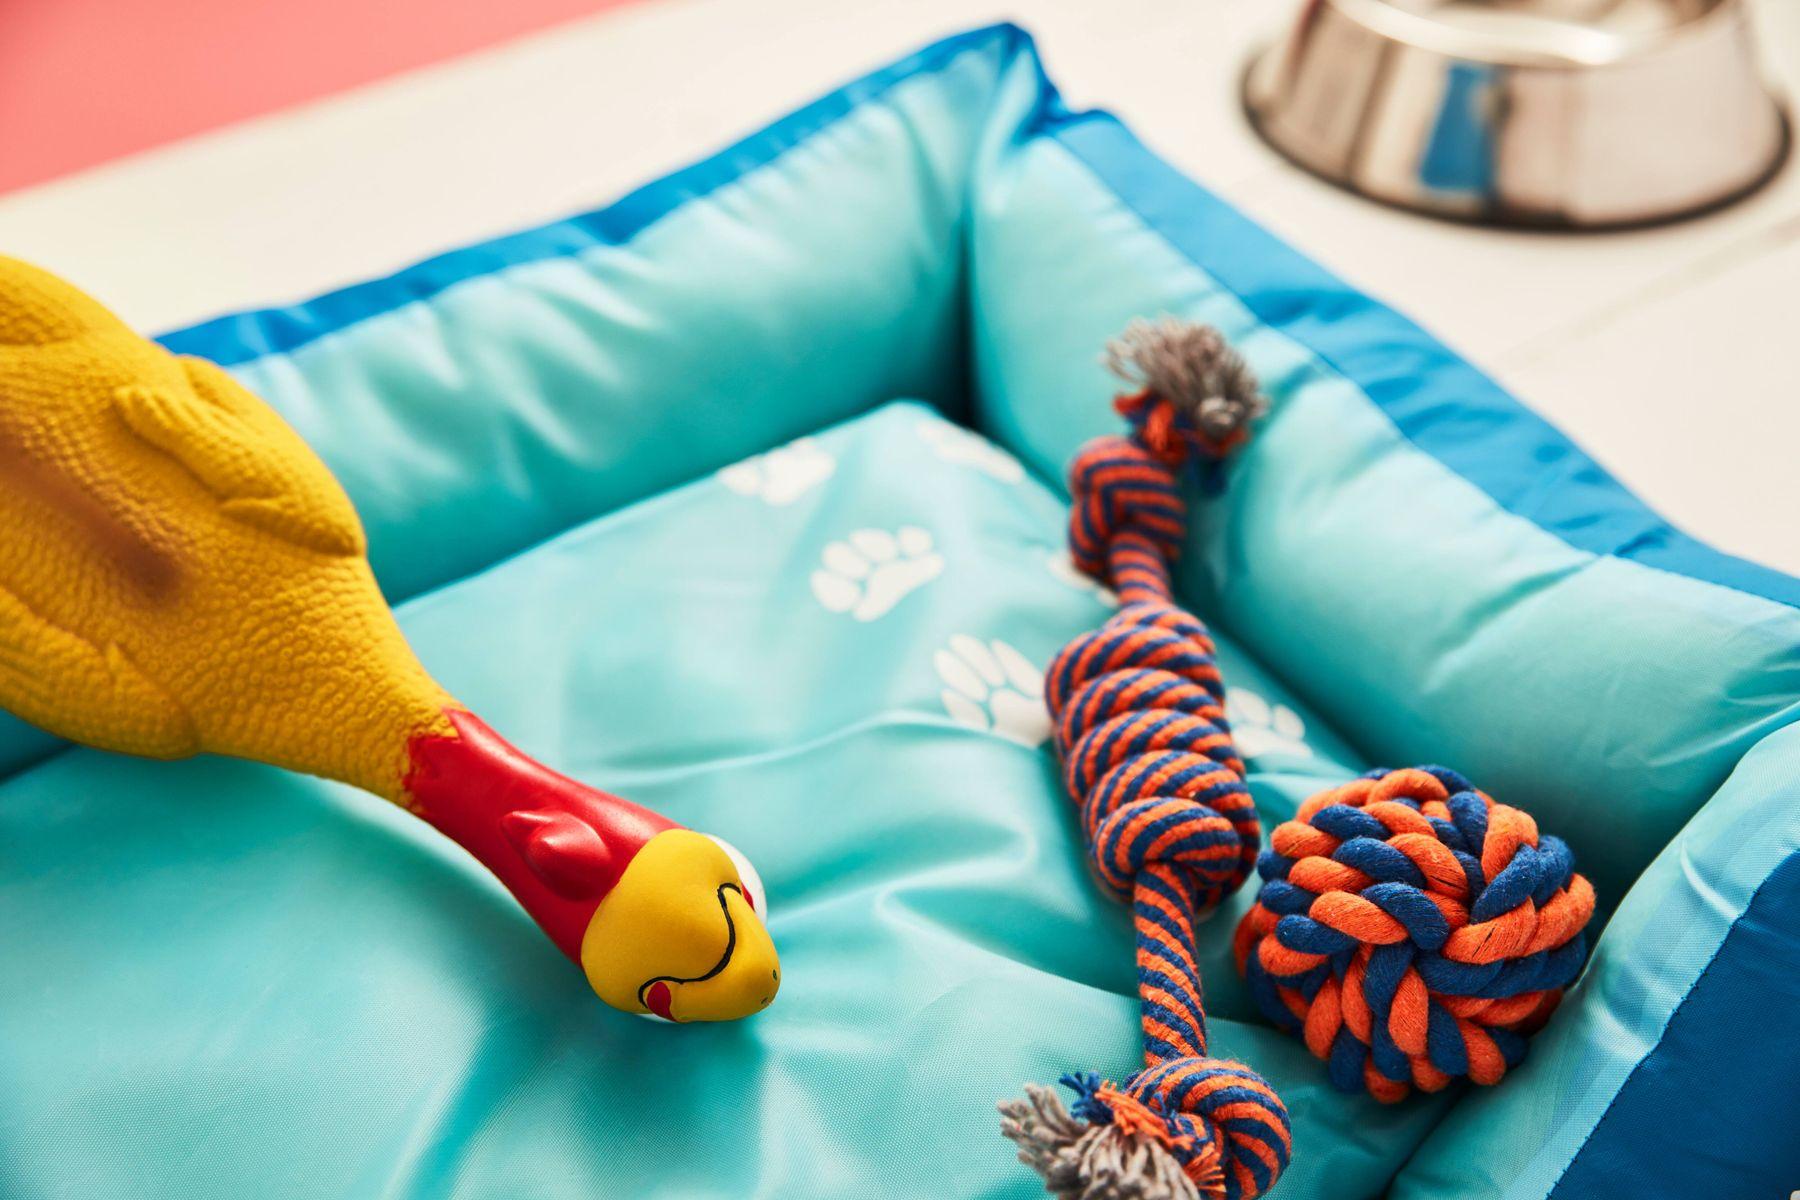 DIY dog toys in a blue dog bed